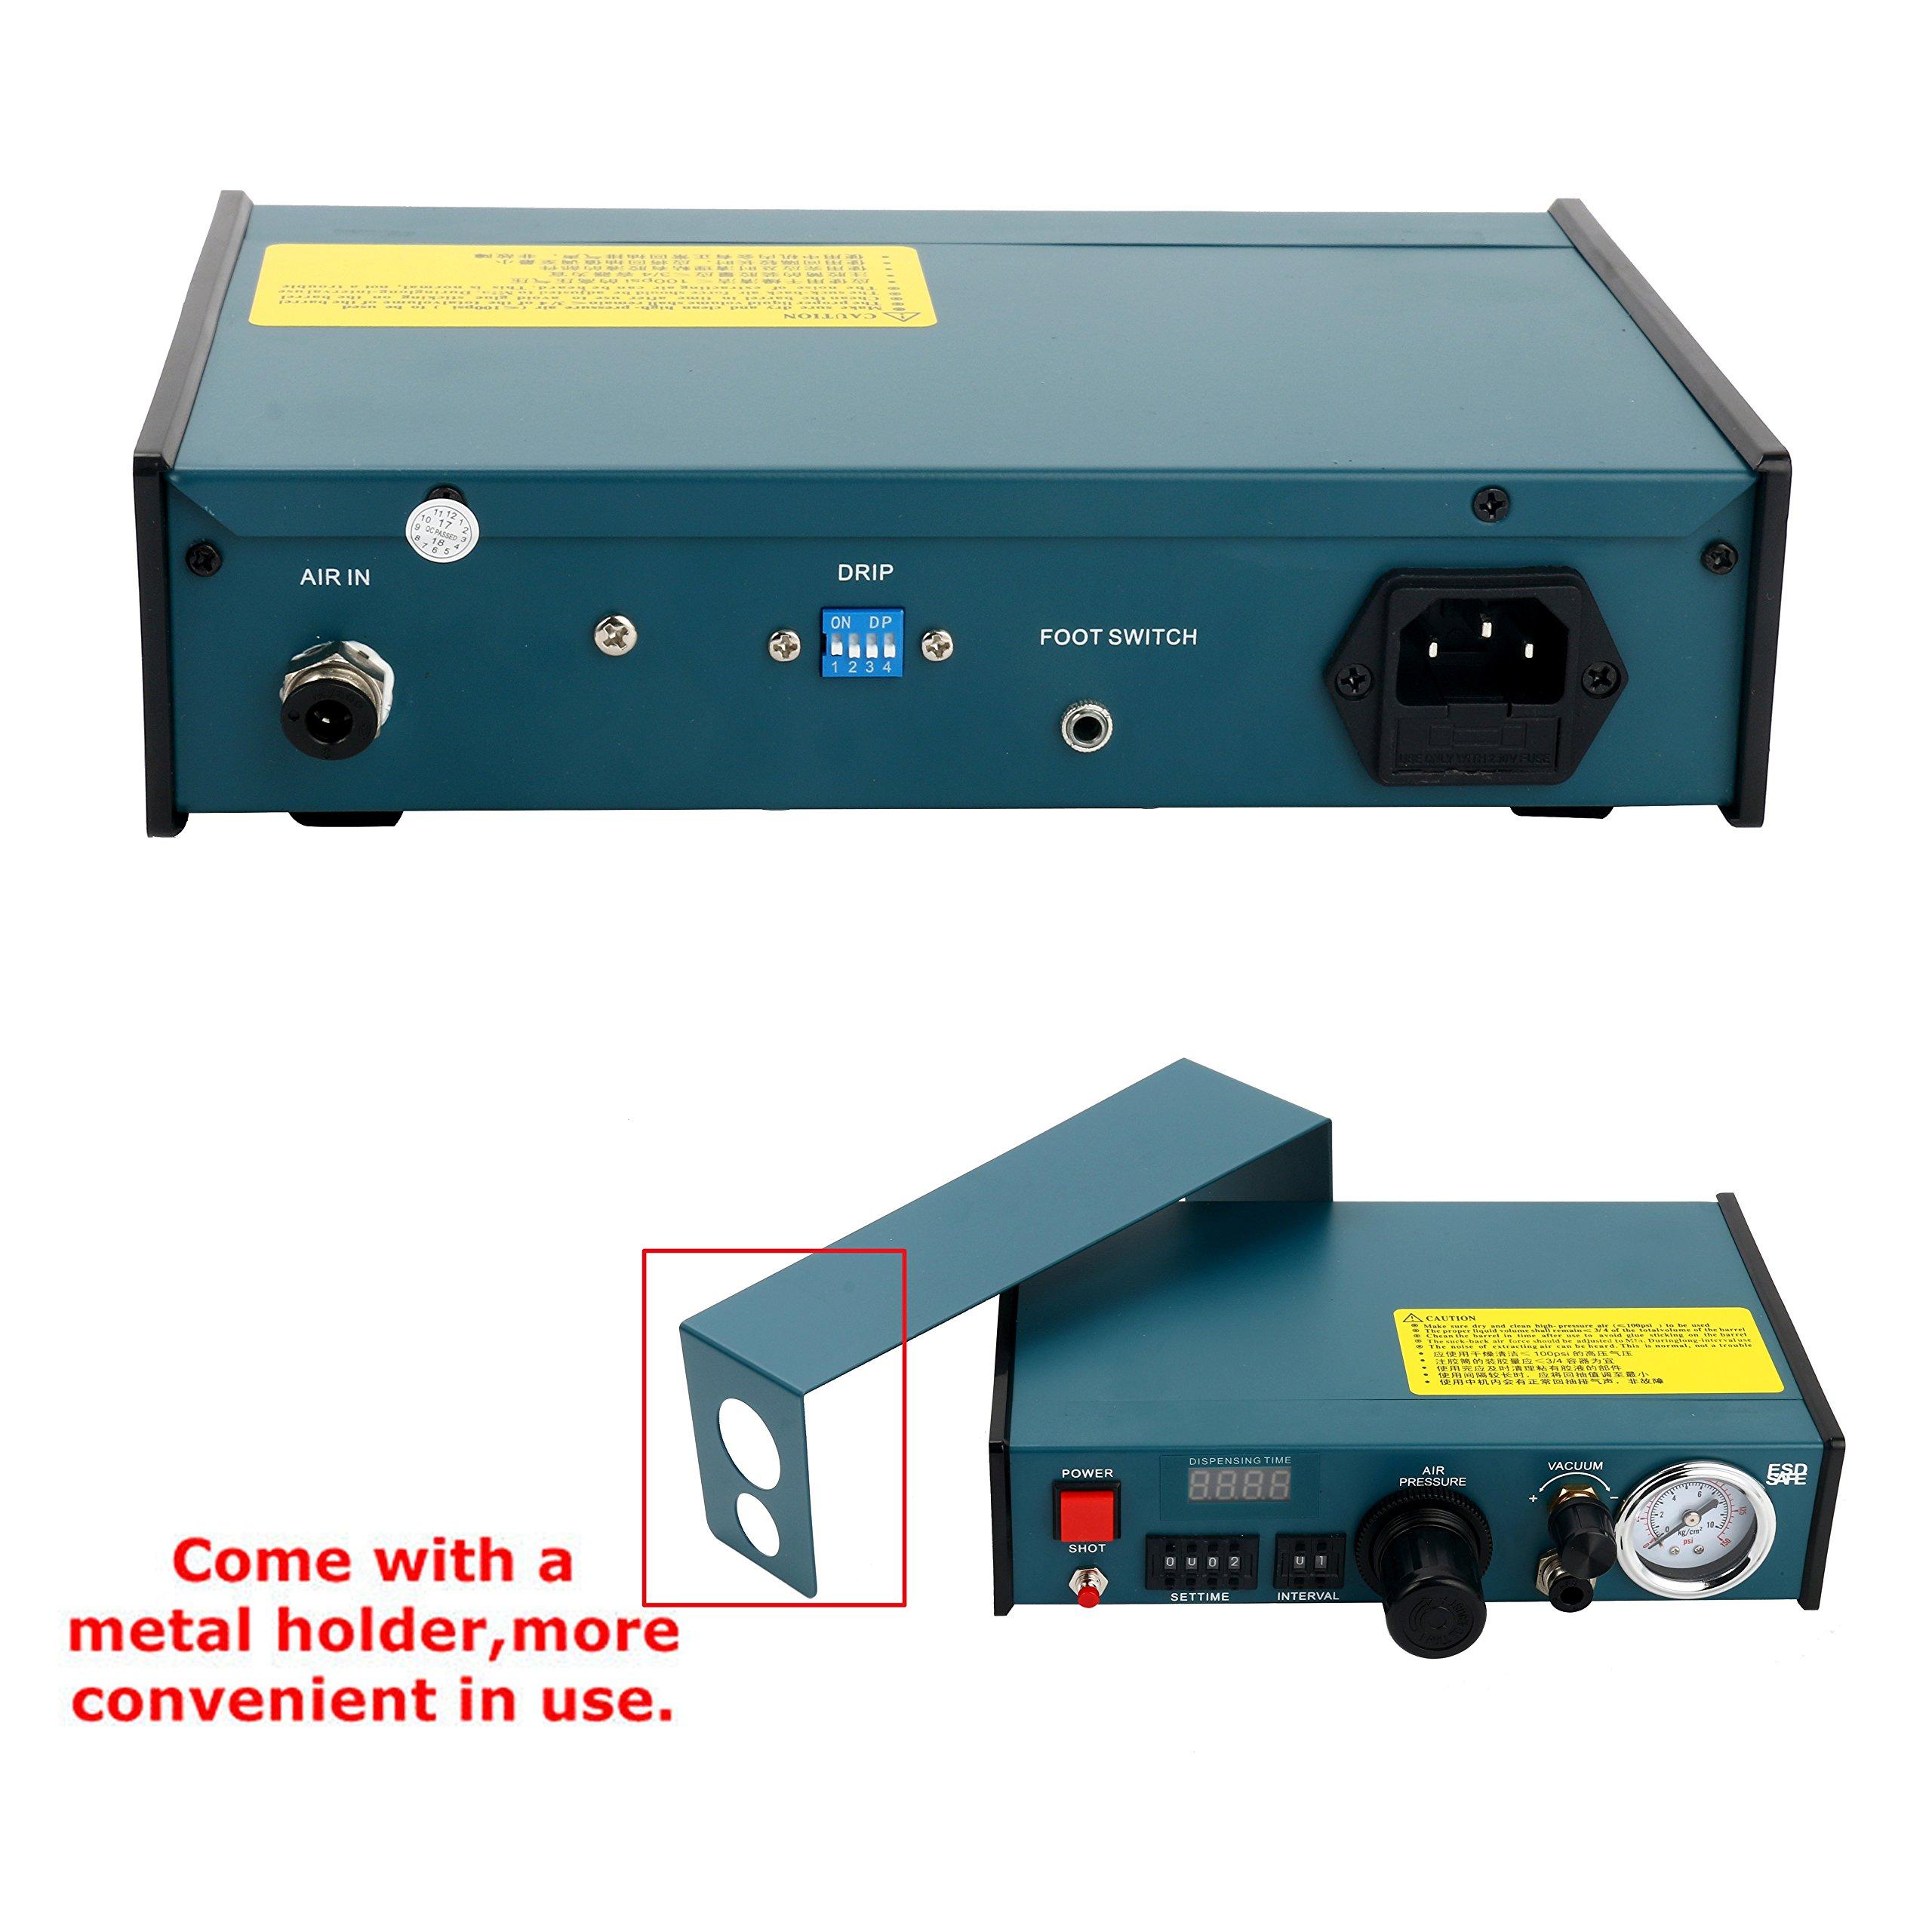 Digital Display Auto Glue Dispenser Solder Paste Liquid Controller Dropper 983A by YaeCCC (Image #3)